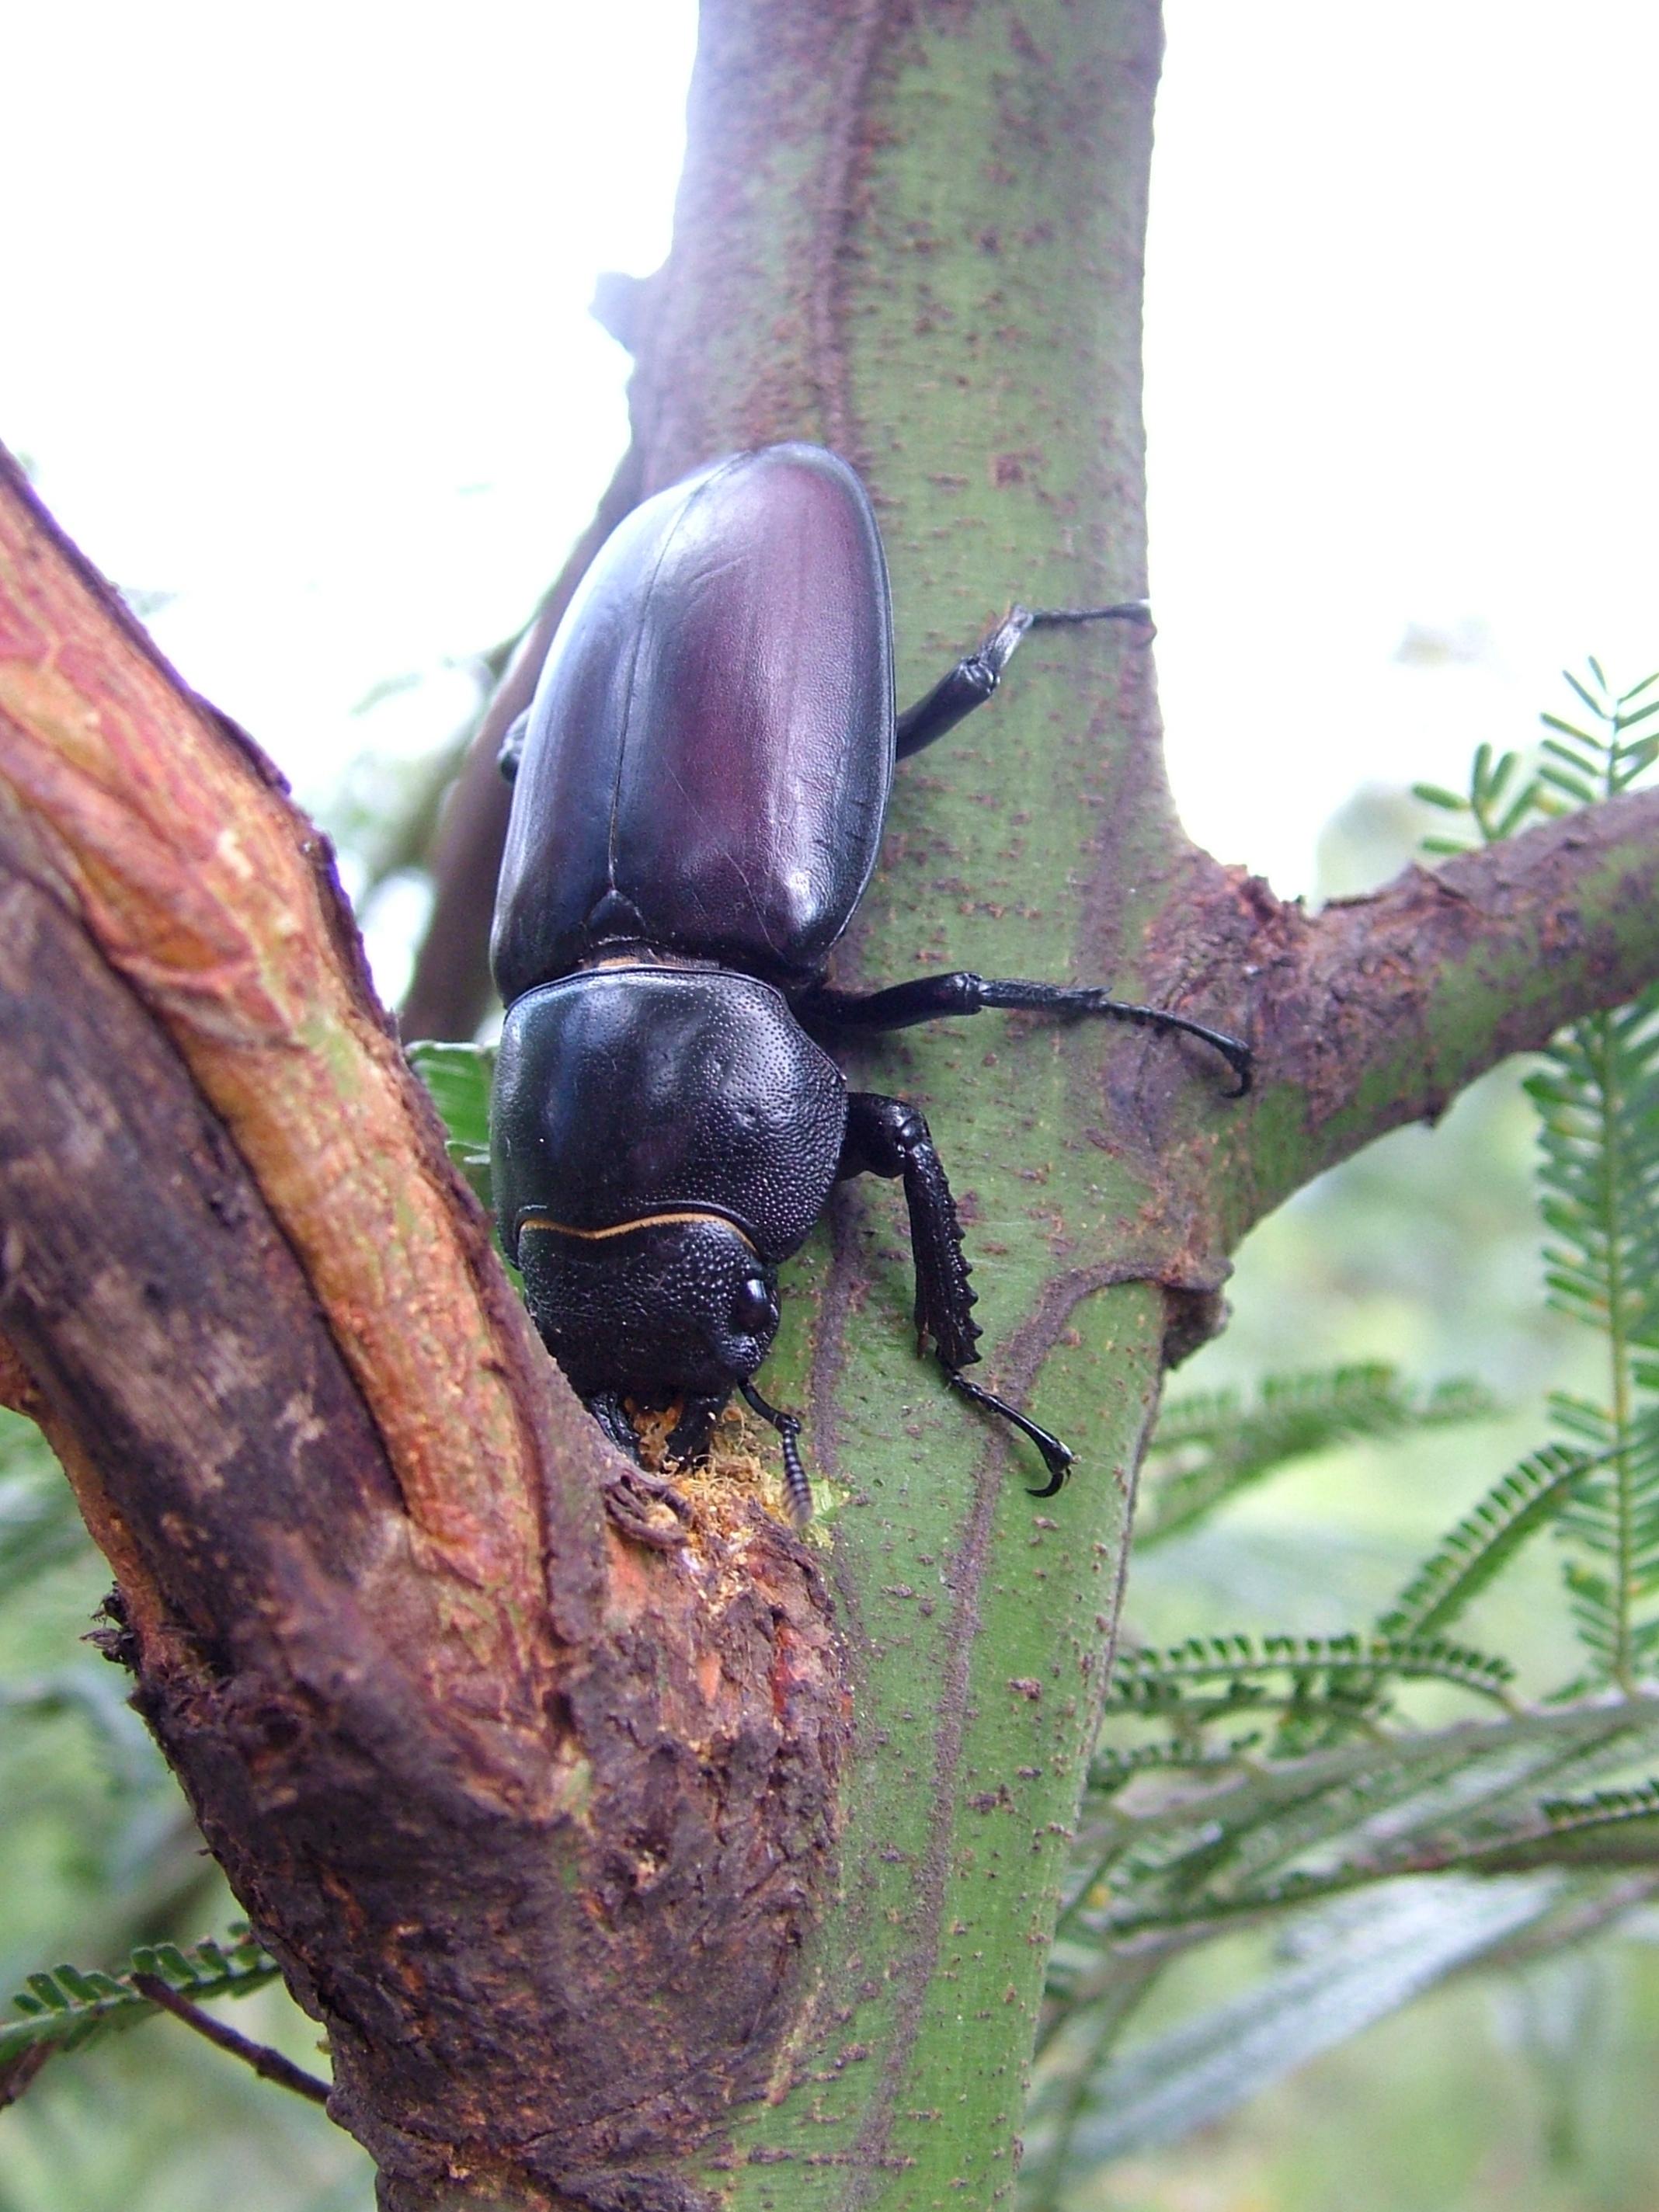 Hexarthrius davisoni female on tree in Kodaikanal